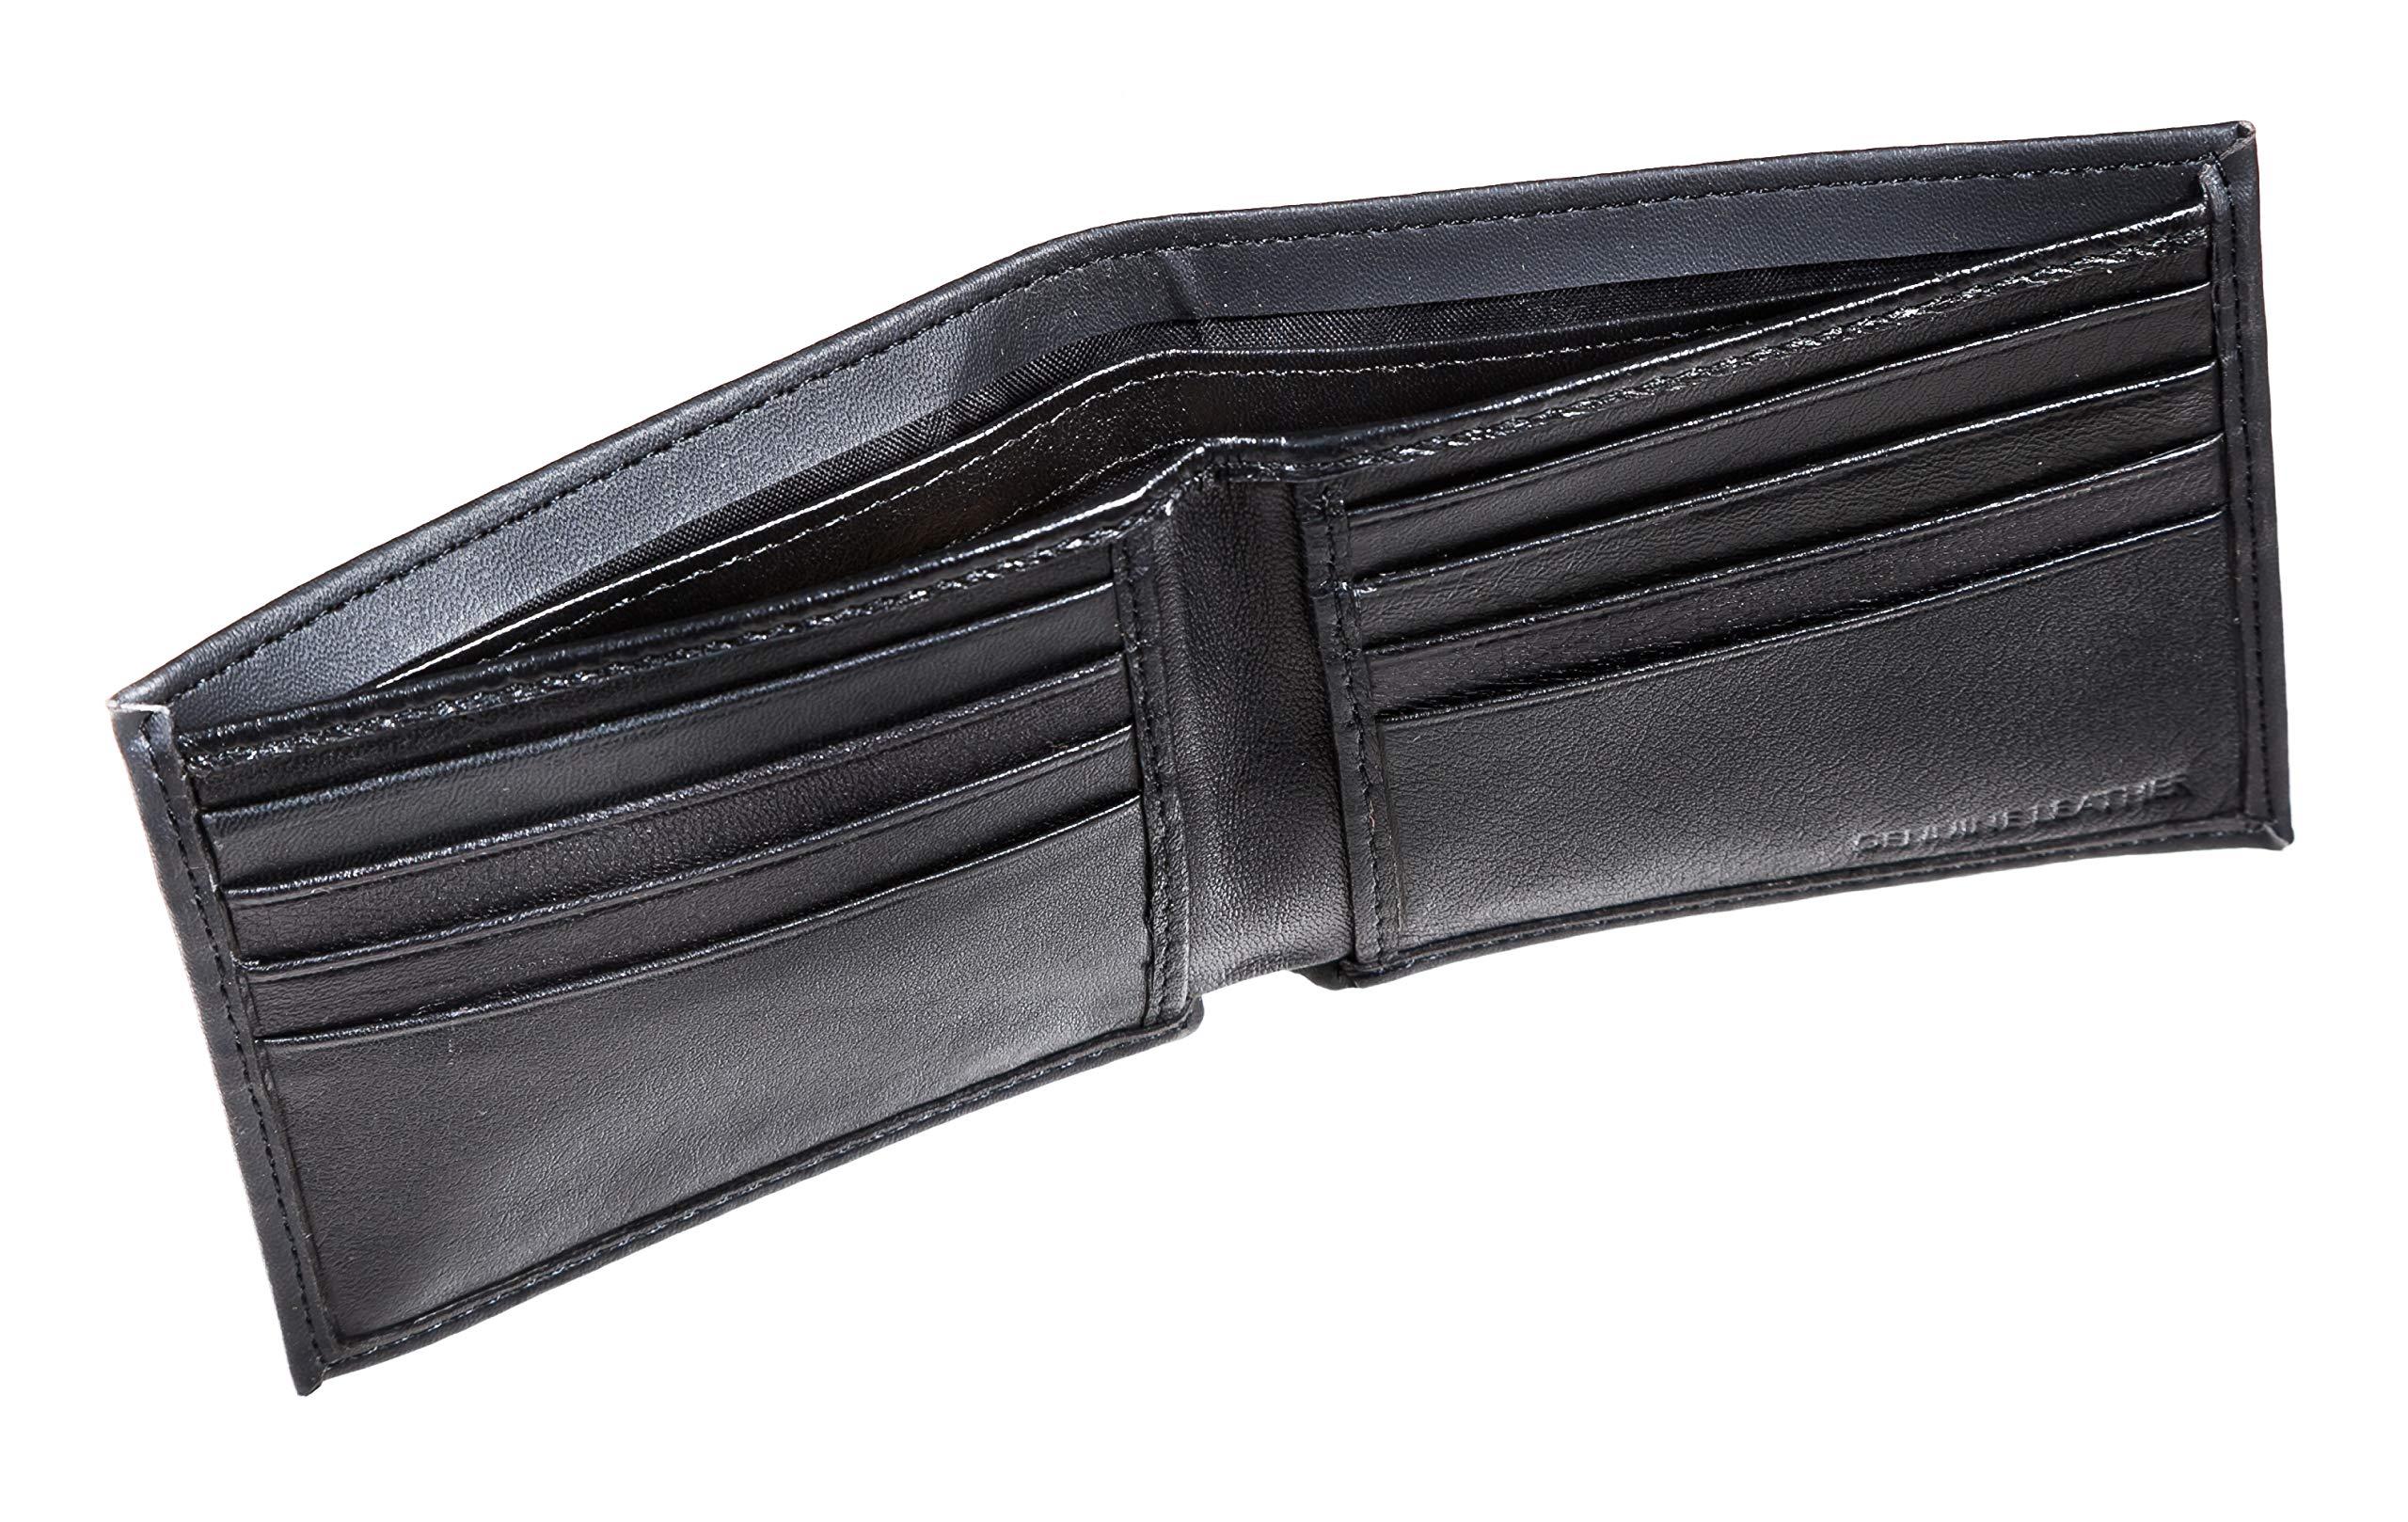 Team Sports America Leather San Francisco 49ers Bi-fold Wallet